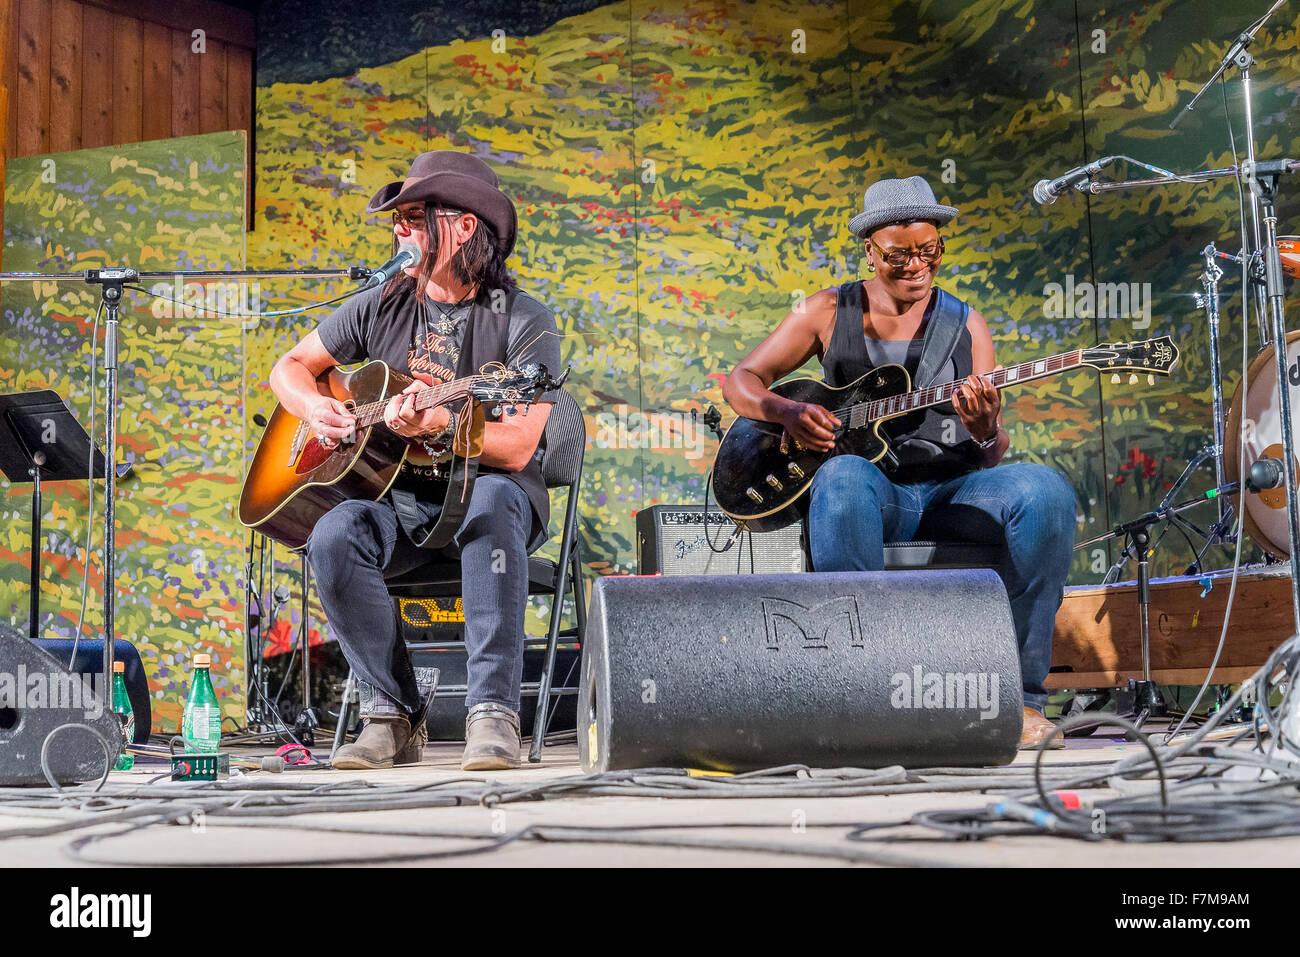 Canmore Folk Music Festival, Canmore, Alberta, Canada - Stock Image